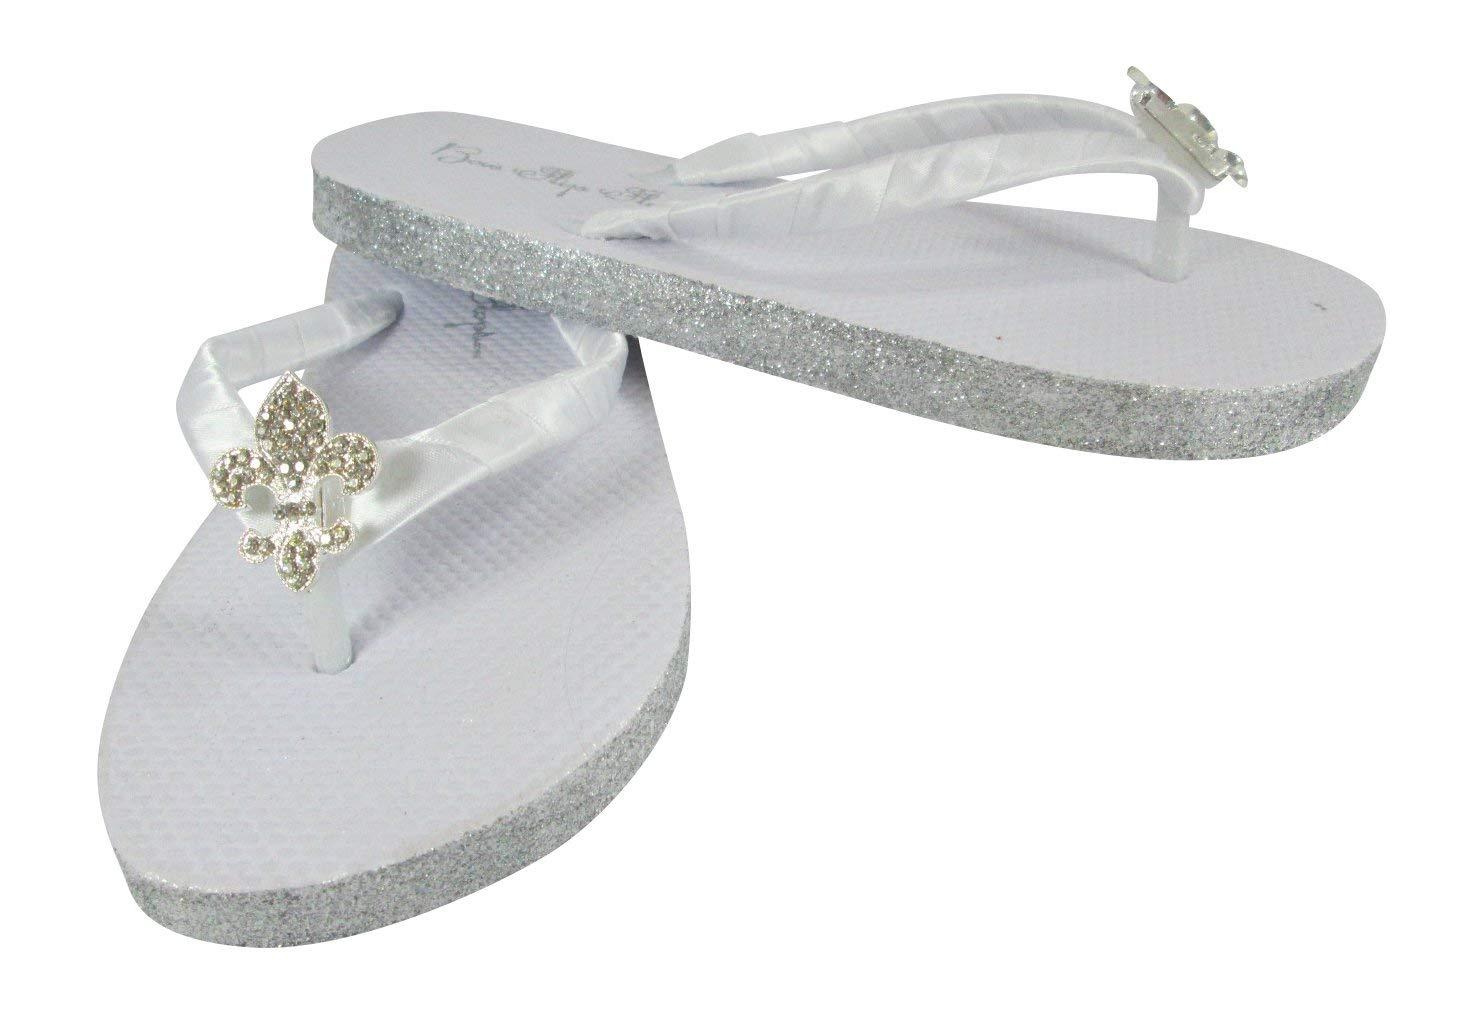 691b9bbc89eb Get Quotations · Fleur de Lis Rhinestone Centerpiece Flat Glitter White Flip  Flops Silver Gold Champagne Rose Gold